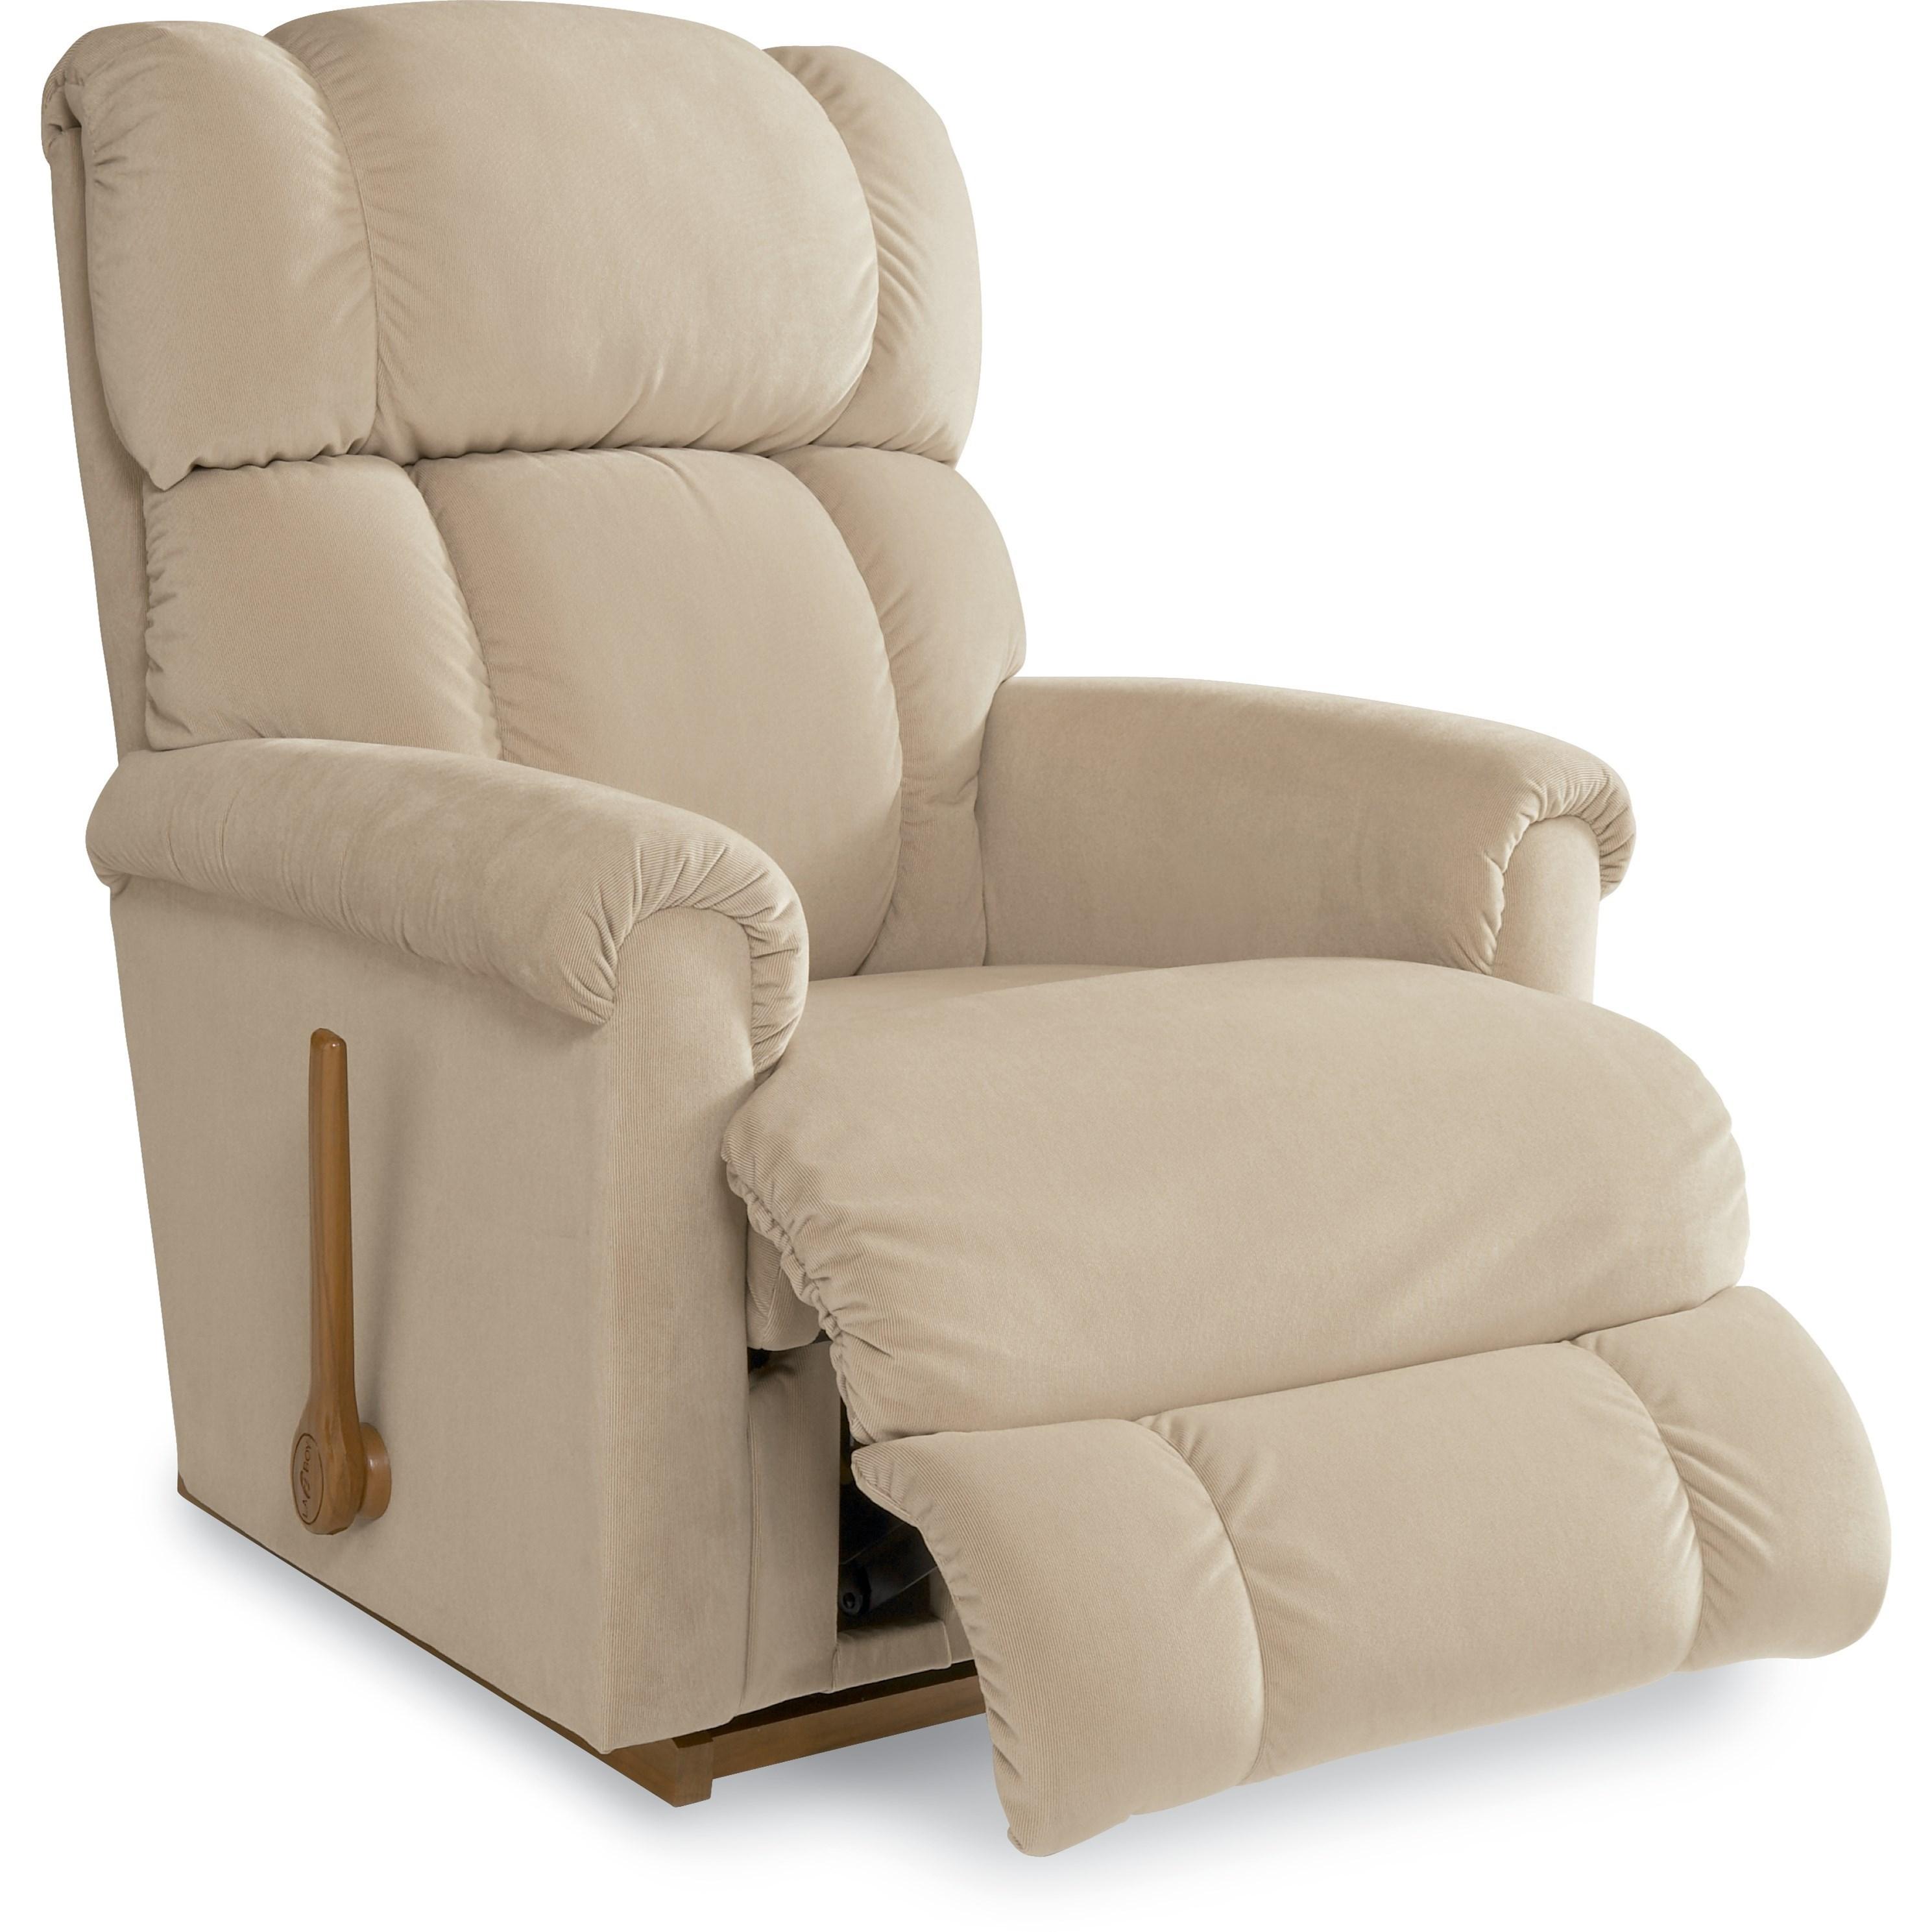 La Z Boy Pinnacle Reclina Rocker 174 Reclining Chair